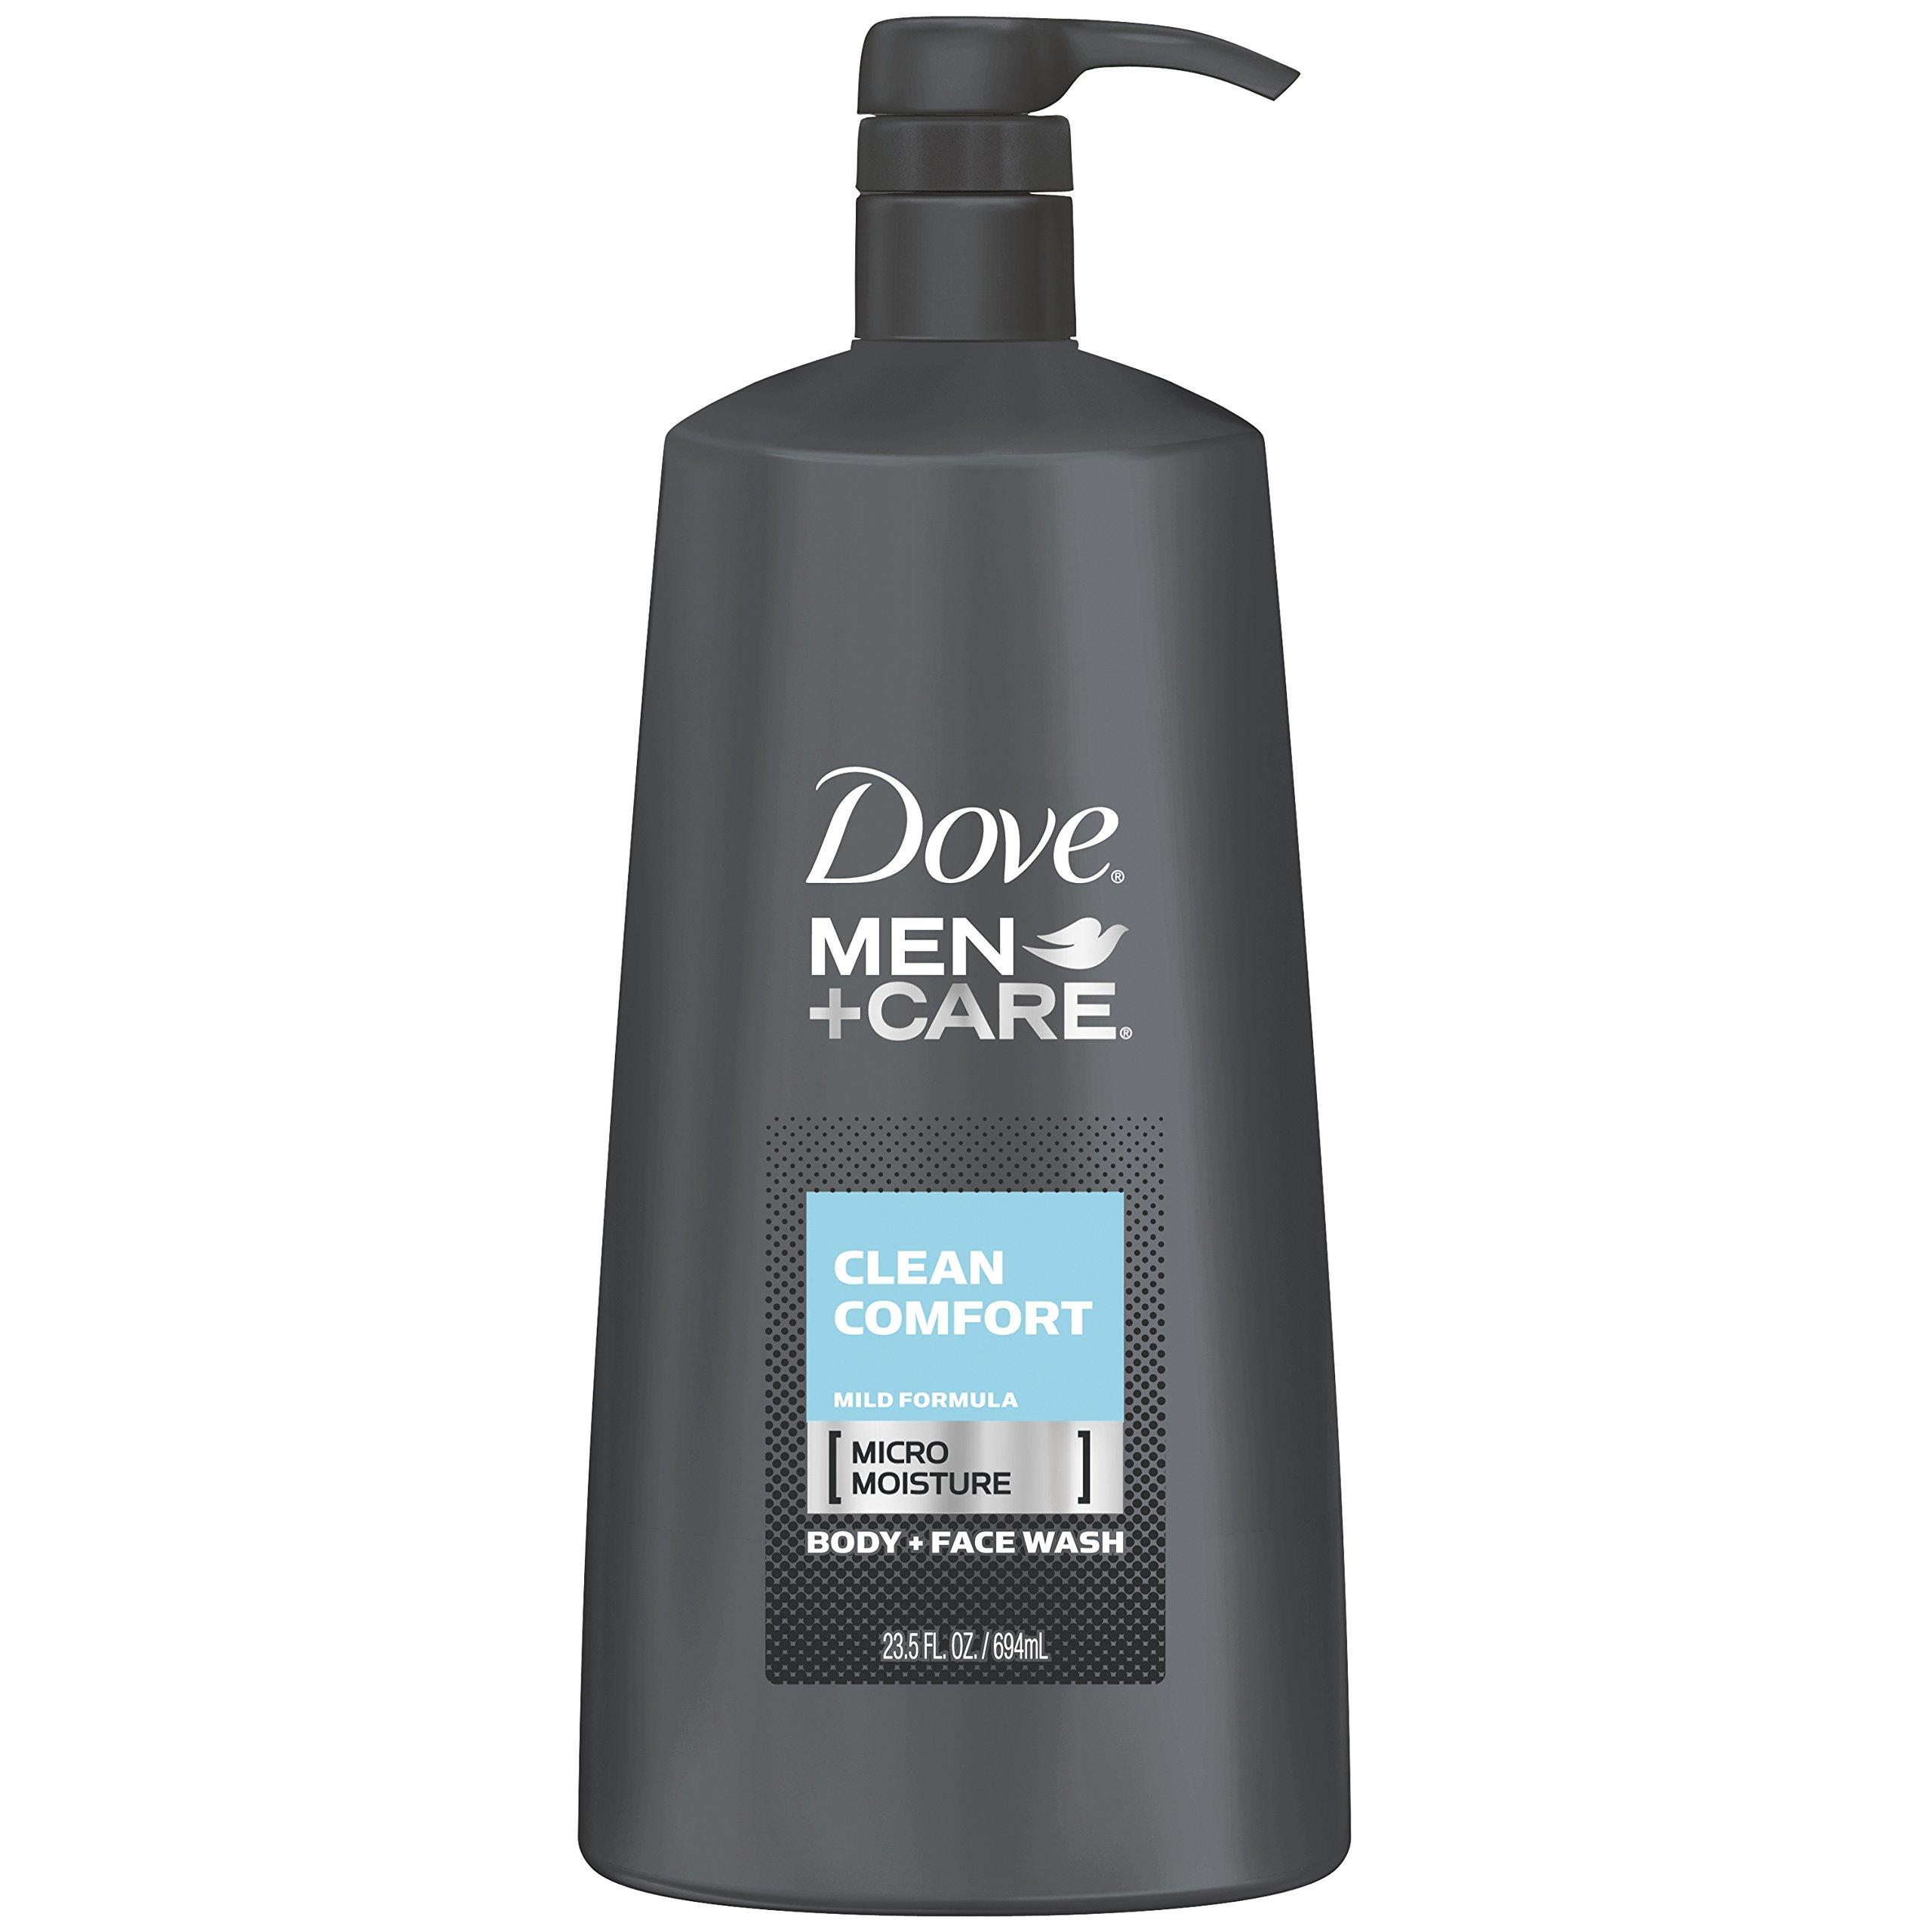 Dove Men+Care Body Wash Pump, Clean Comfort 23.5 oz